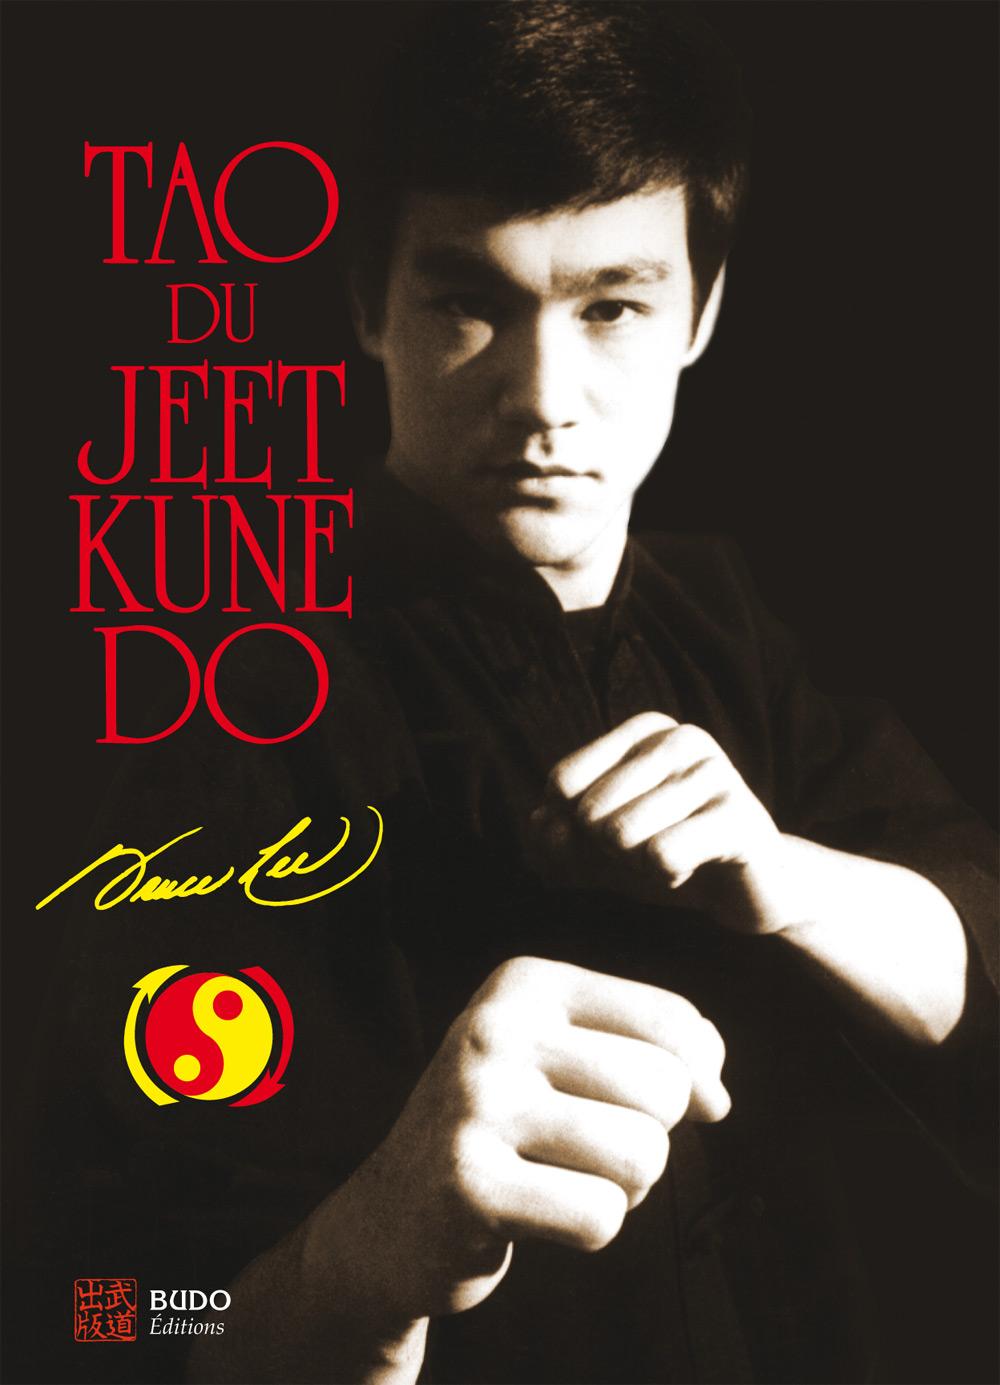 LE TAO DU JEET KUNE DO